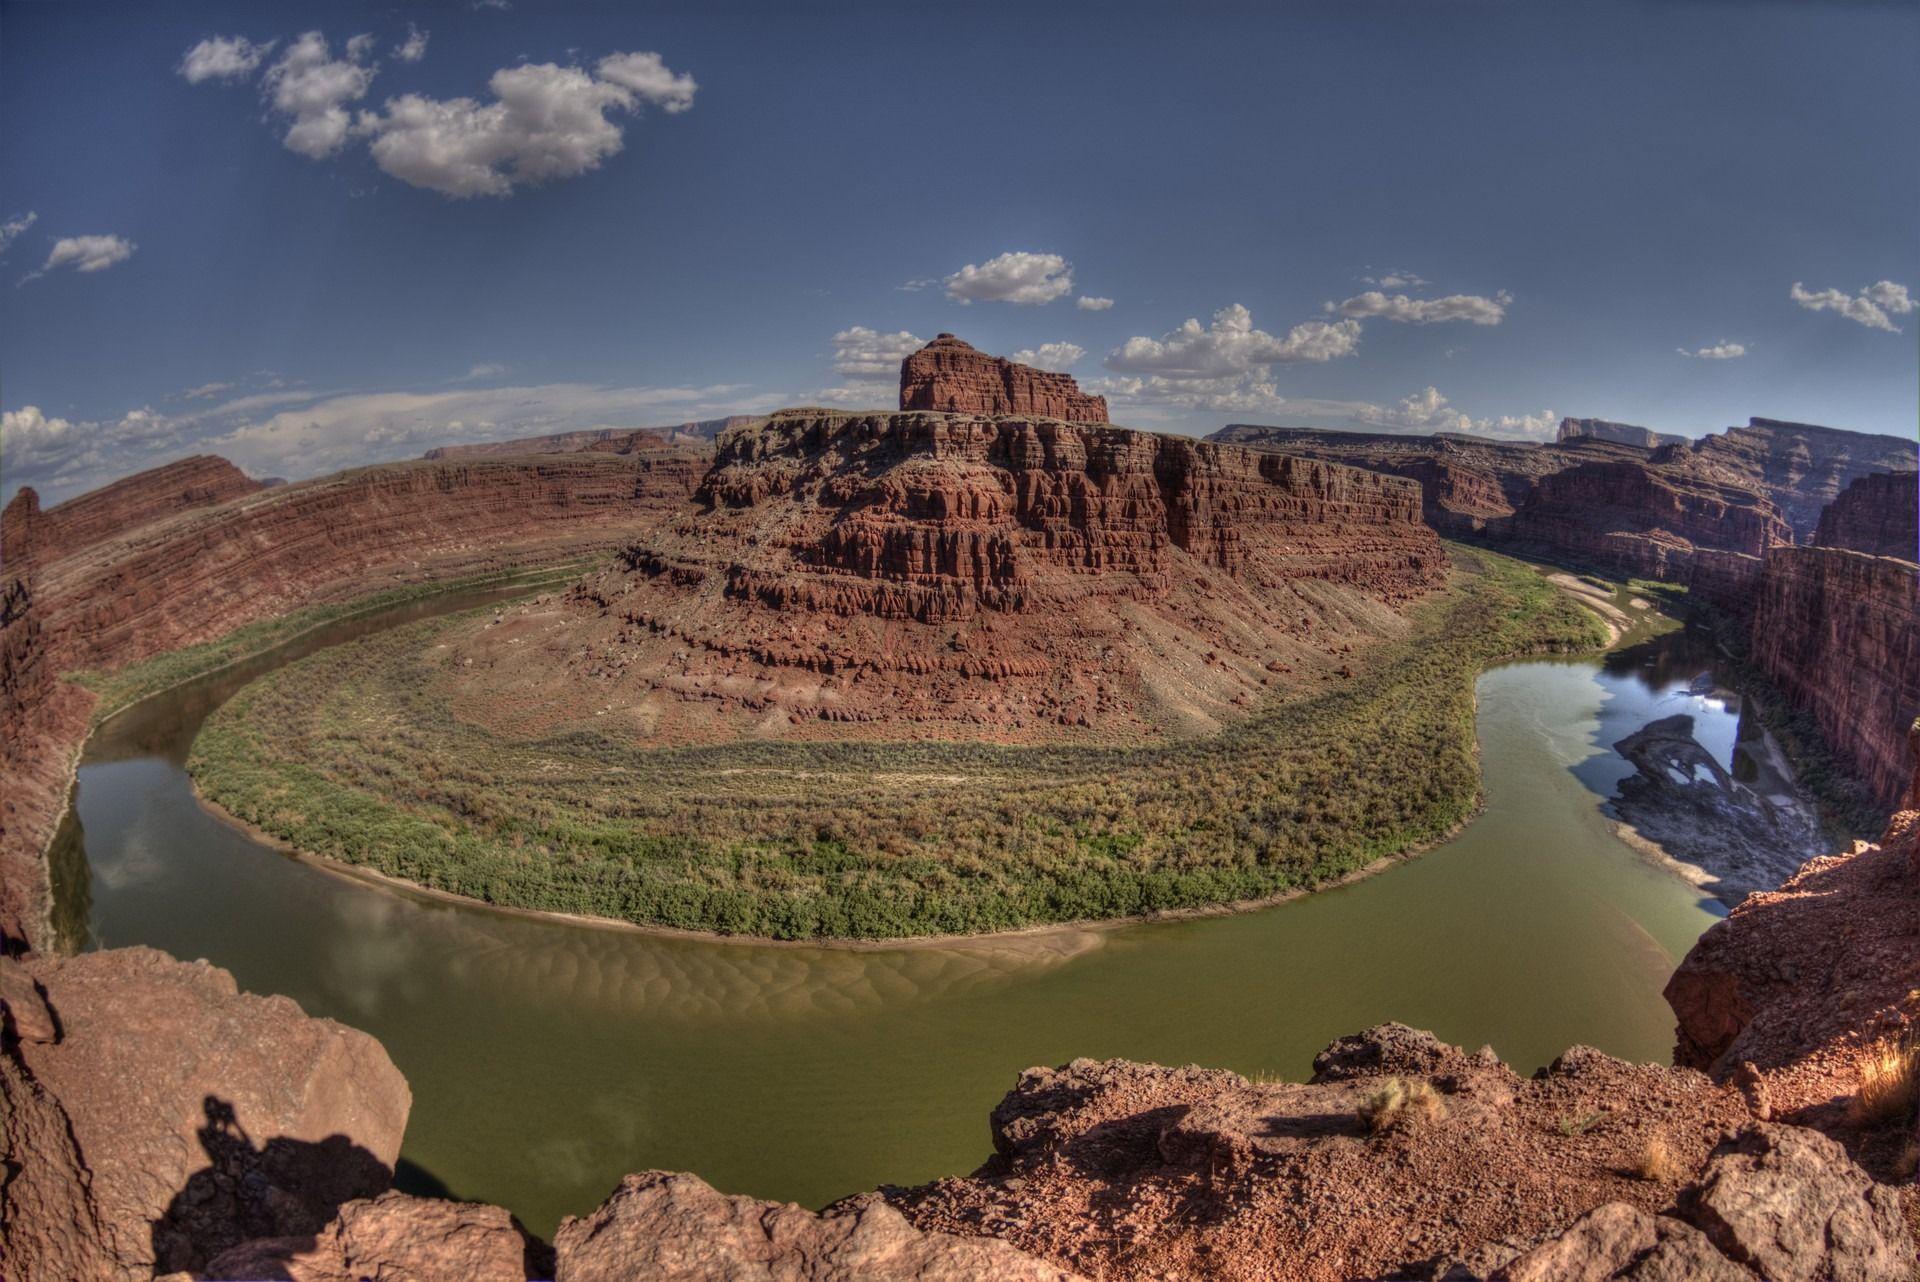 Dziki Zachód USA 2020 - cz. 2. północny zachód